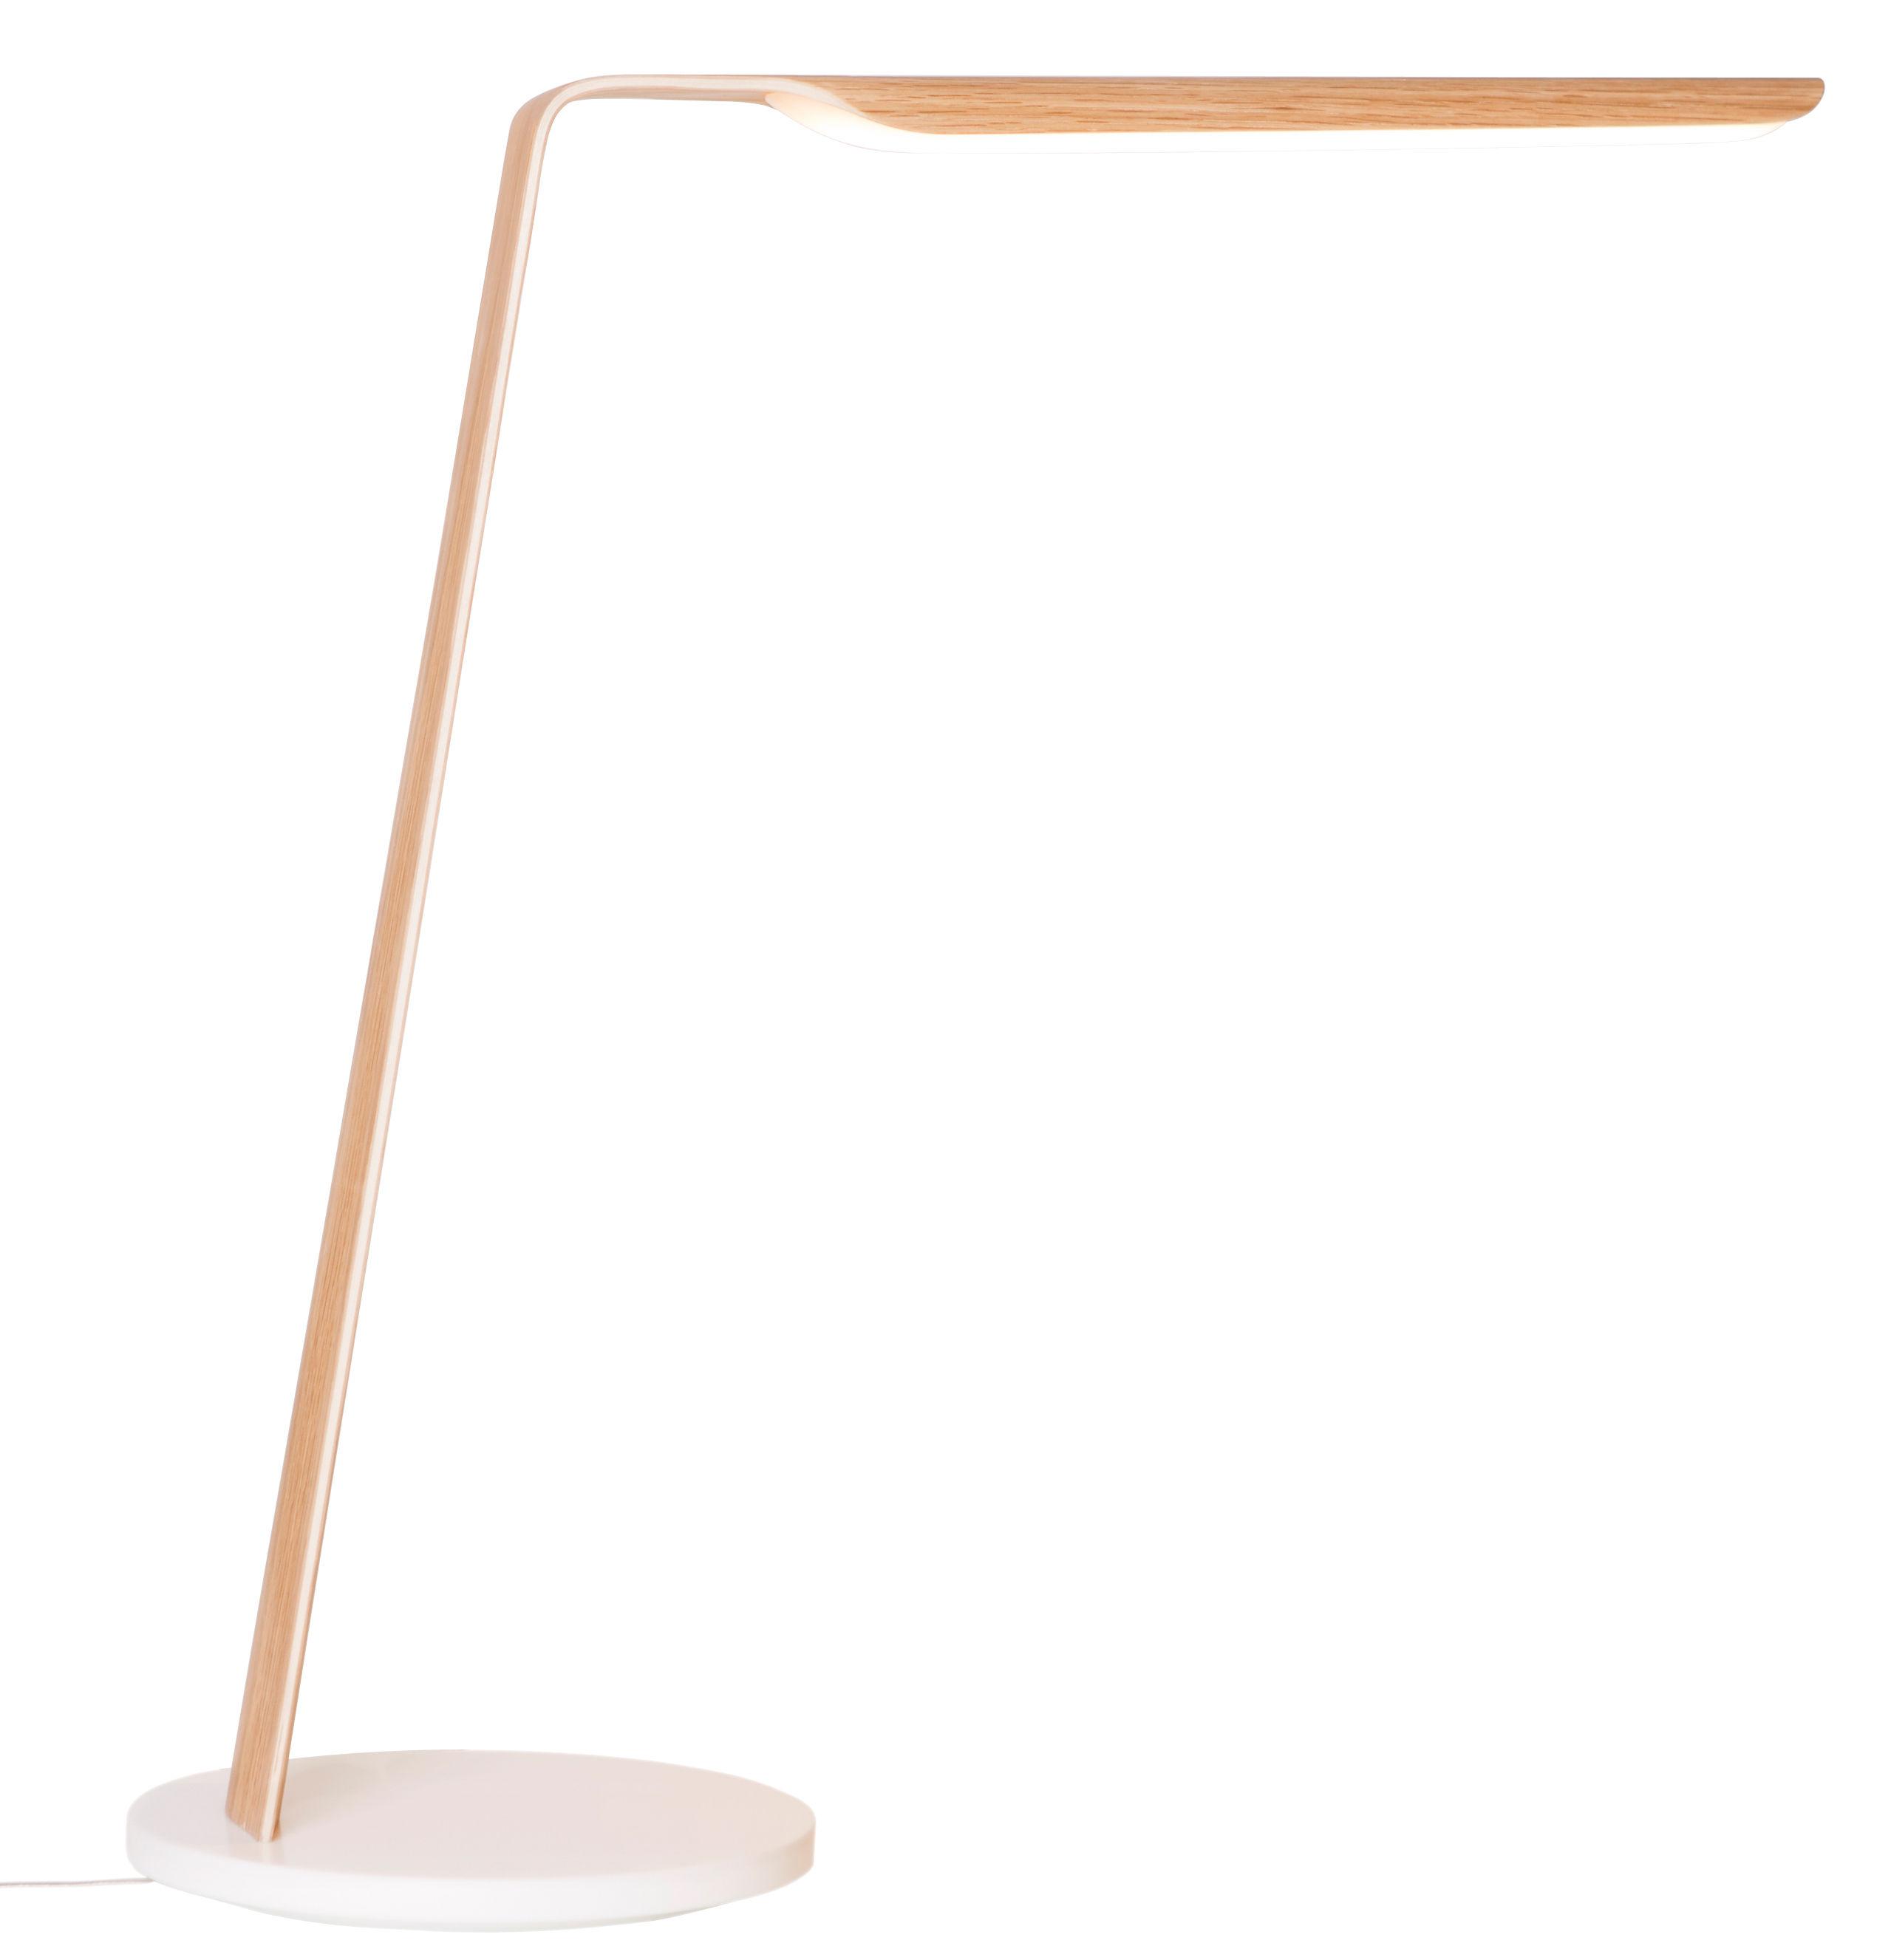 Luminaire - Lampes de table - Lampe de table Swan / H 46,5 cm - Tunto - Chêne - Chêne